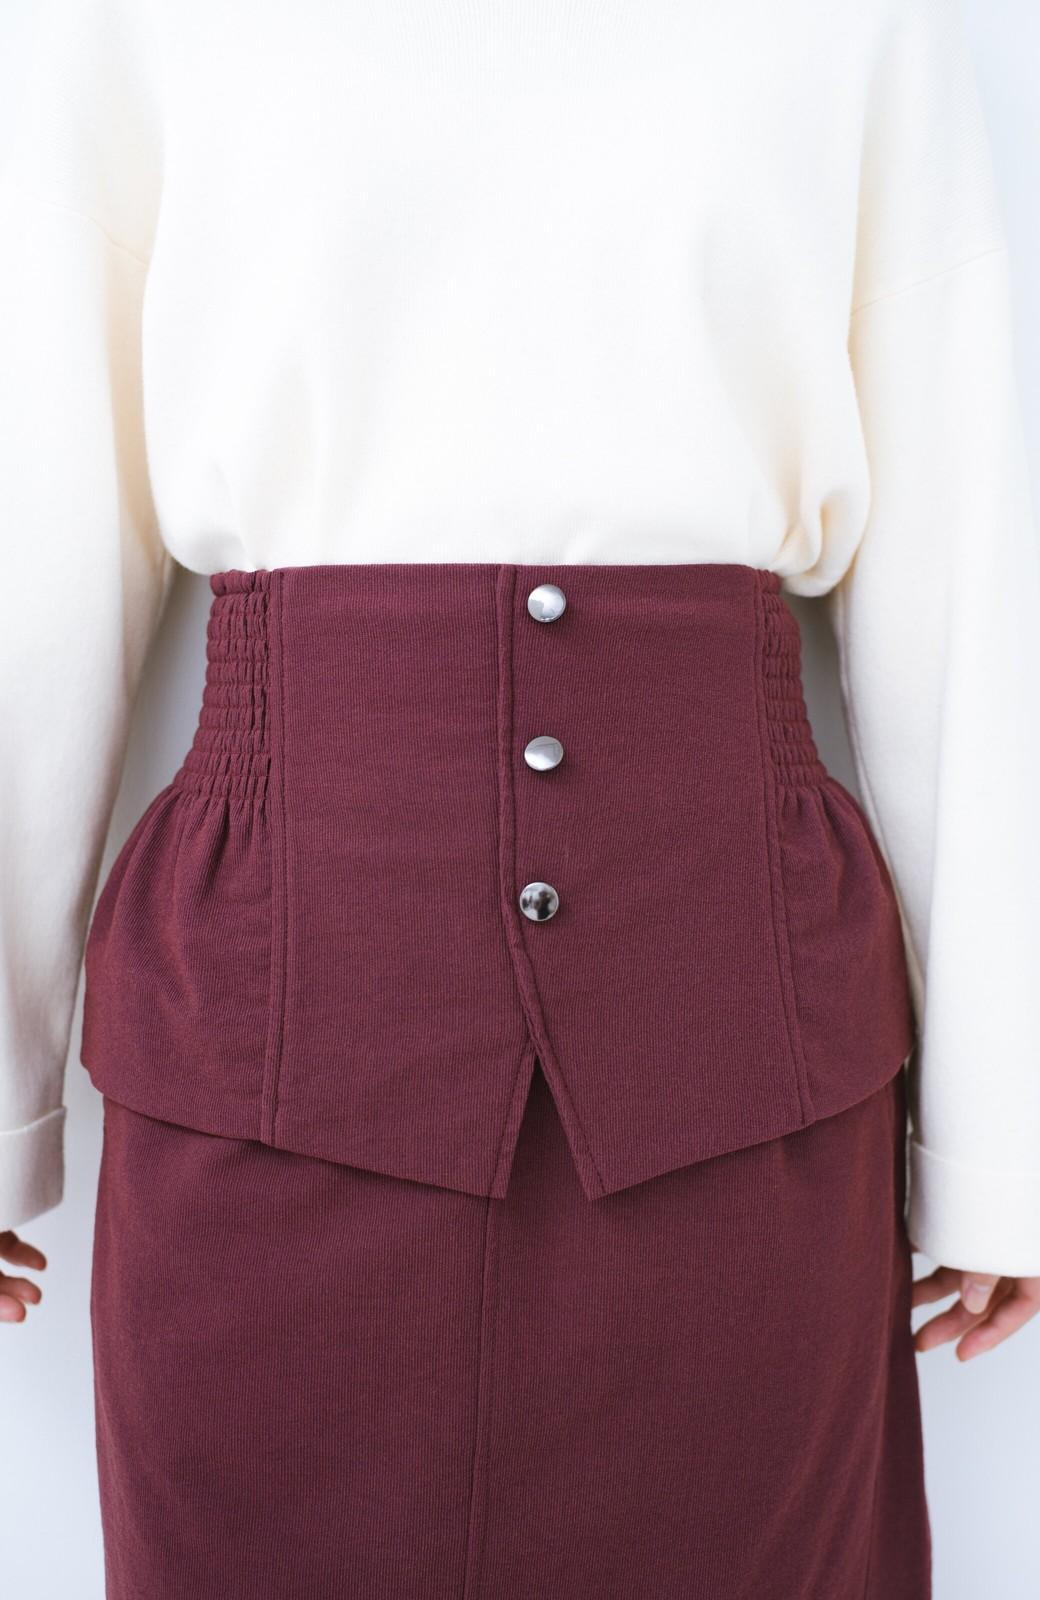 haco!  腹巻きとは呼ばせない ブルー期も華やかに過ごせる消臭加工裏地付きフリルデザインスカートセット【ブルー期】女の子バンザイ!プロジェクト <ボルドー>の商品写真8